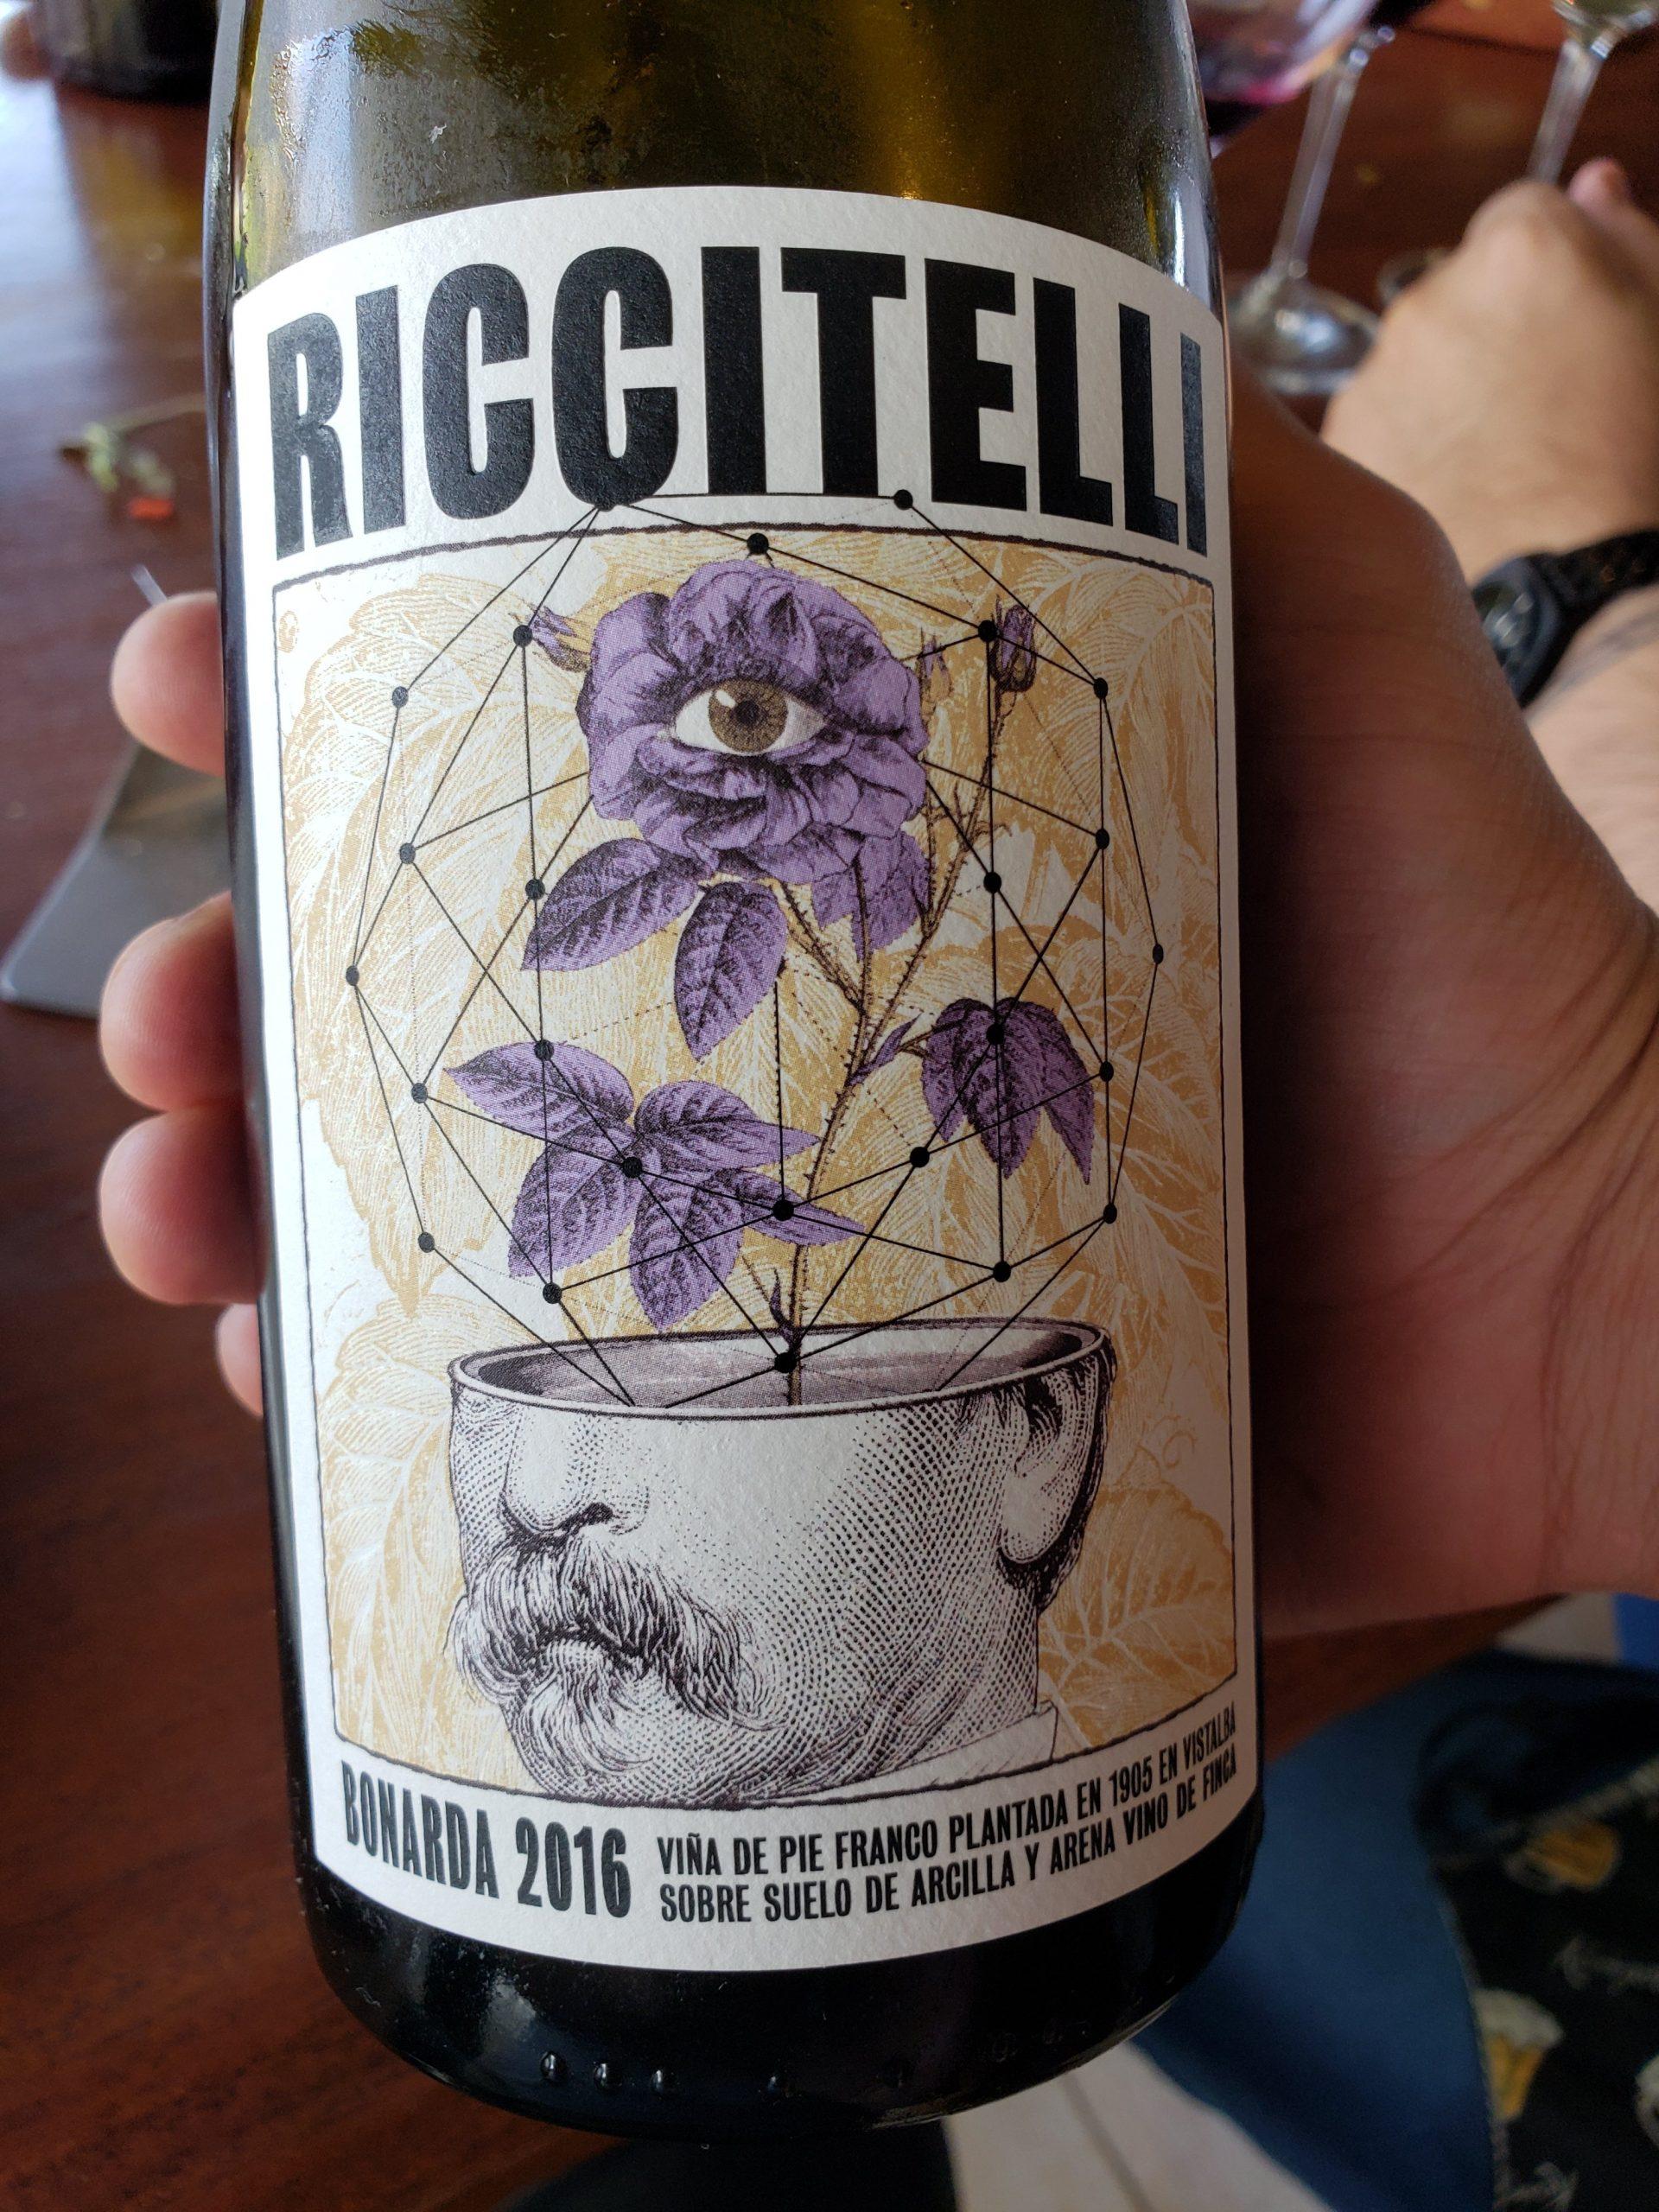 Riccitelli Bistró - Riccitelli Wines - Matías Riccitelli Vinos de Finca Bonarda 2016